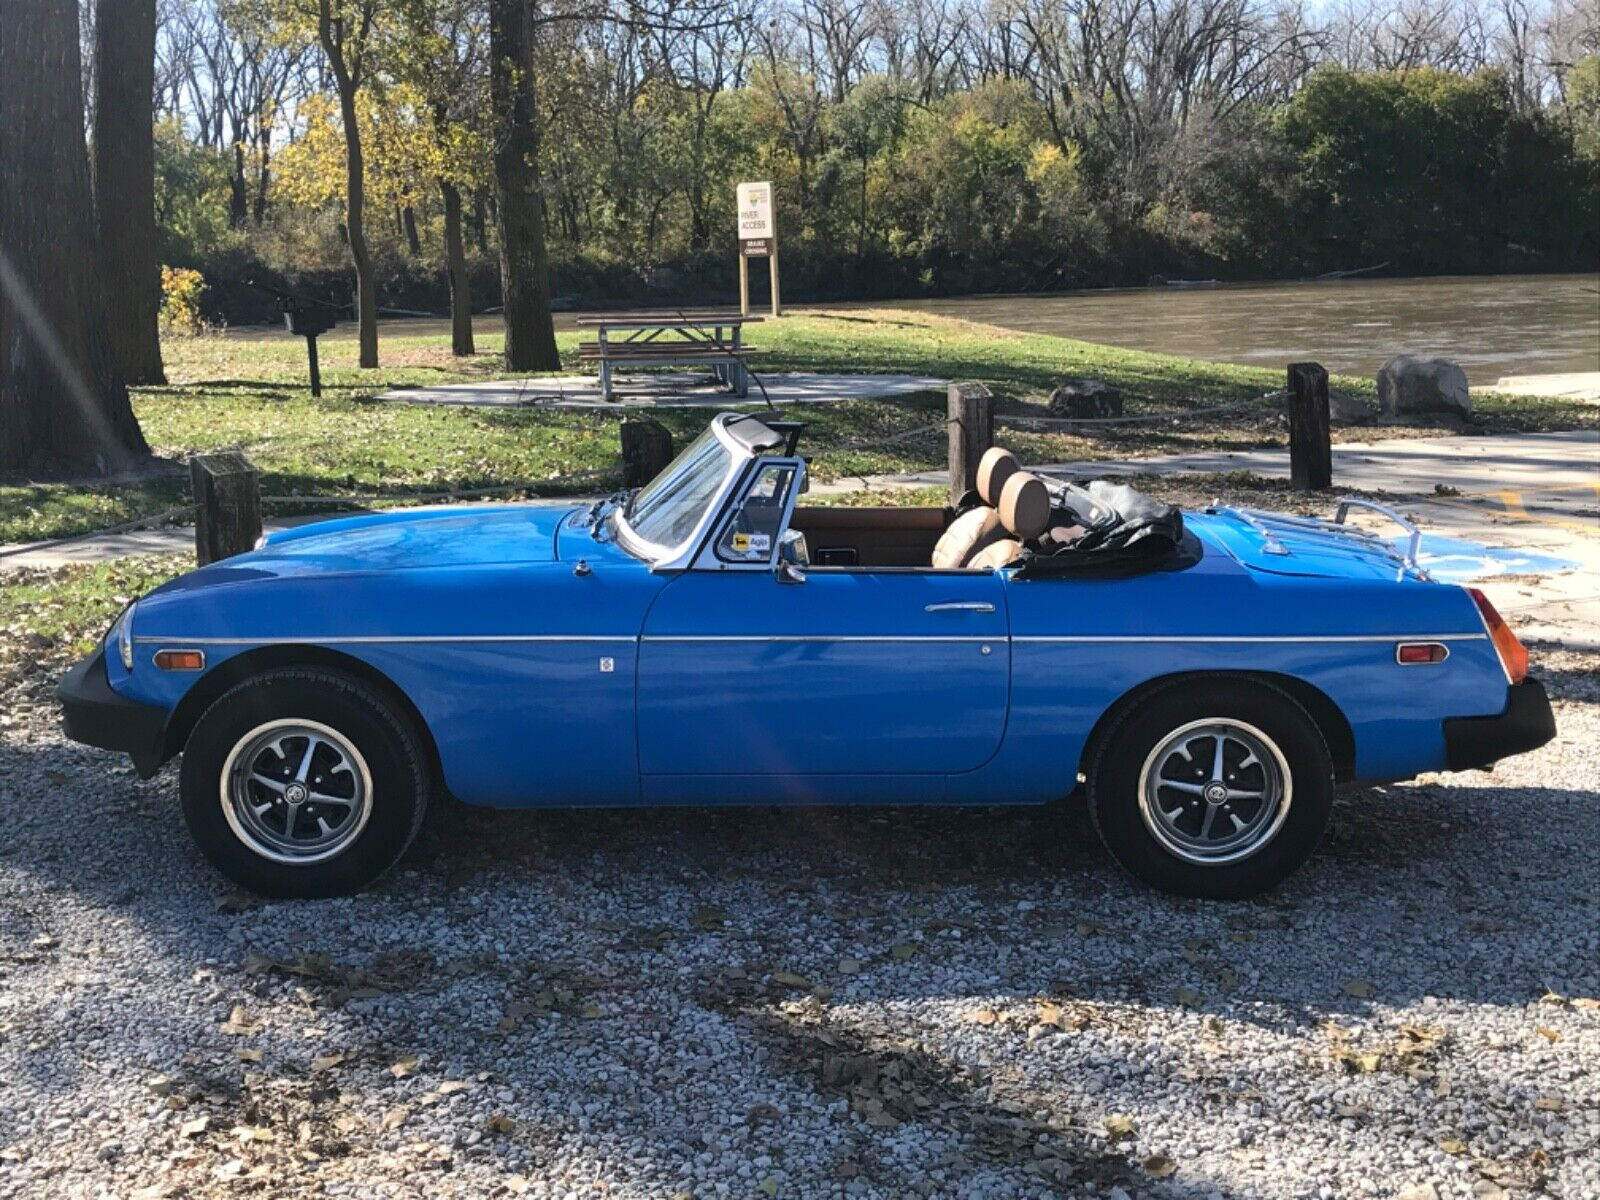 1979 MG B  59k Miles Blue Convertible 1.8L I4 4-Speed Manual. Just serviced